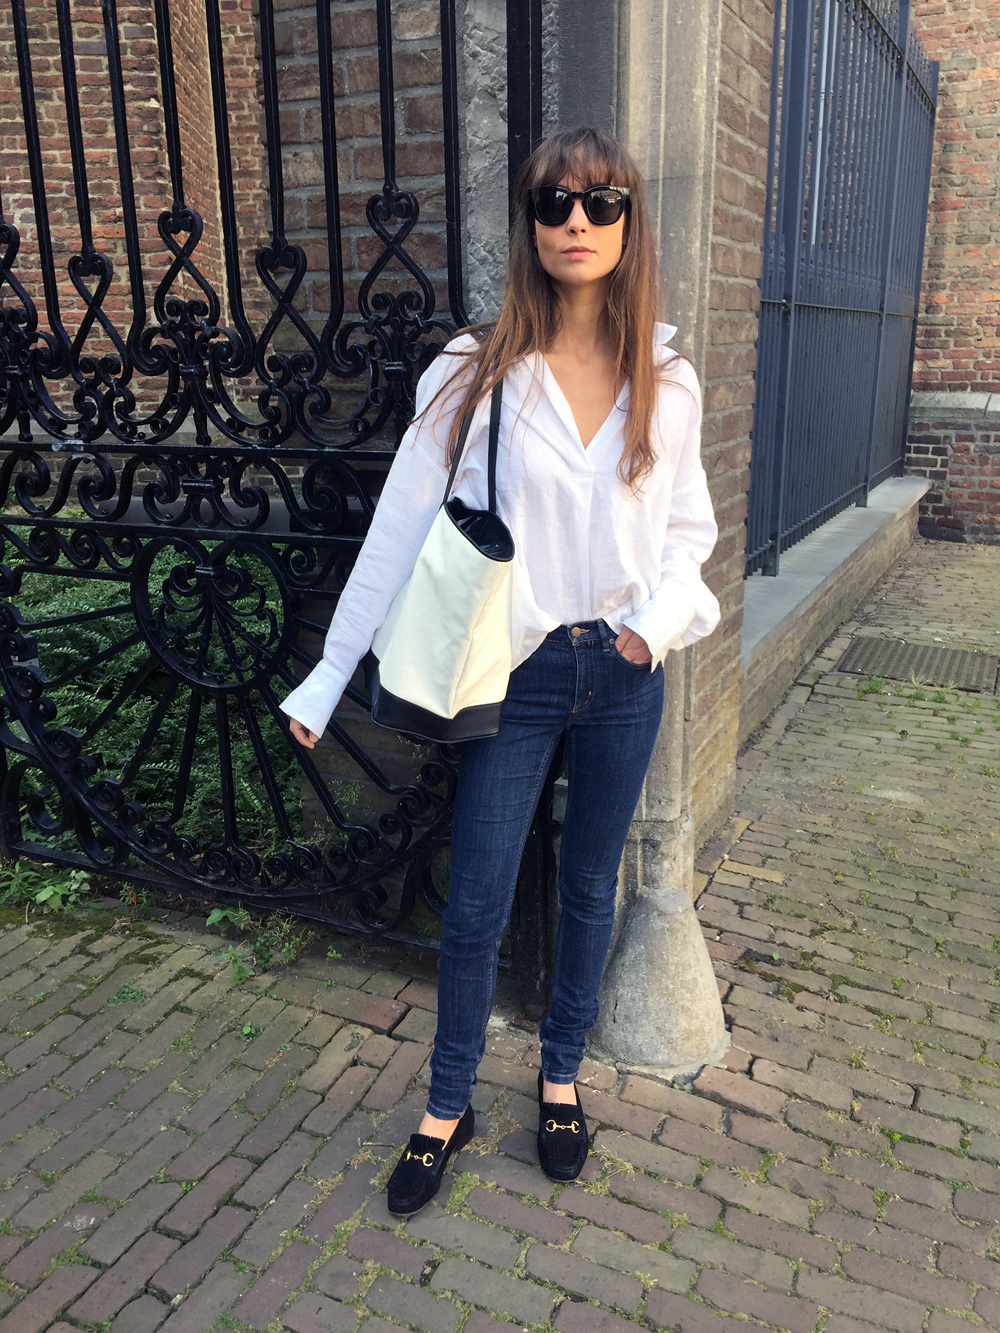 Givenchy sunnies - Zara shirt - COS denim - Haus of Mana bag - Gucci Loafer. 5.PNG